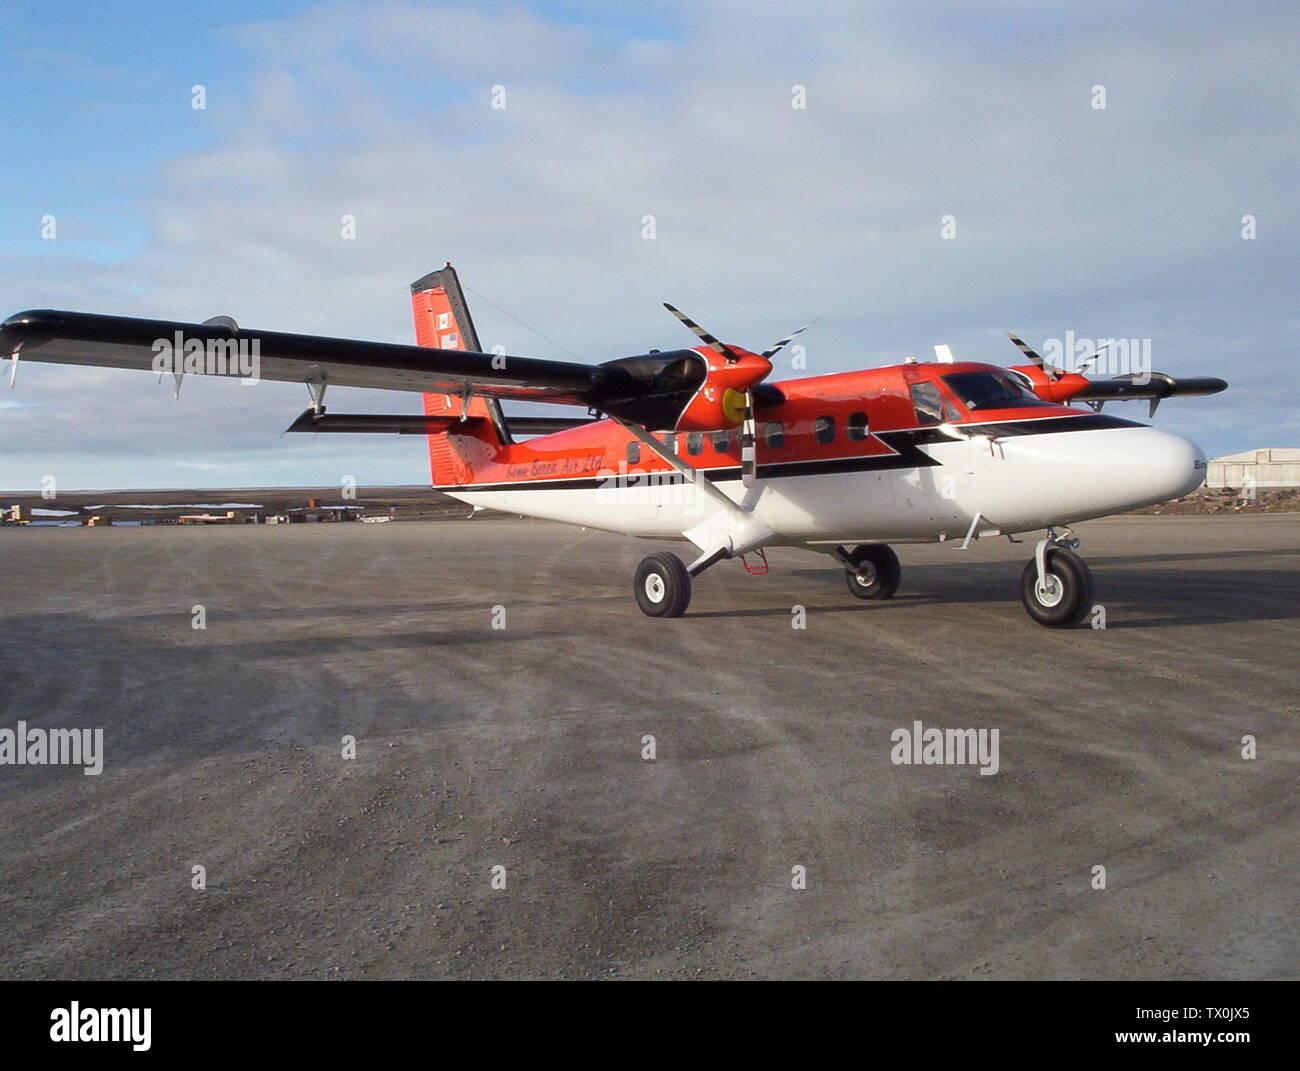 'English: C-FBBV Kenn Borek Air Ltd. de Havilland Twin Otter (DHC-6) 300 Series at Cambridge Bay Airport, Nunavut, Canada; 17 June 2005, 22:13 MDT (18 June 2005, 04:13 UTC); Own work; CambridgeBayWeather; ' - Stock Image